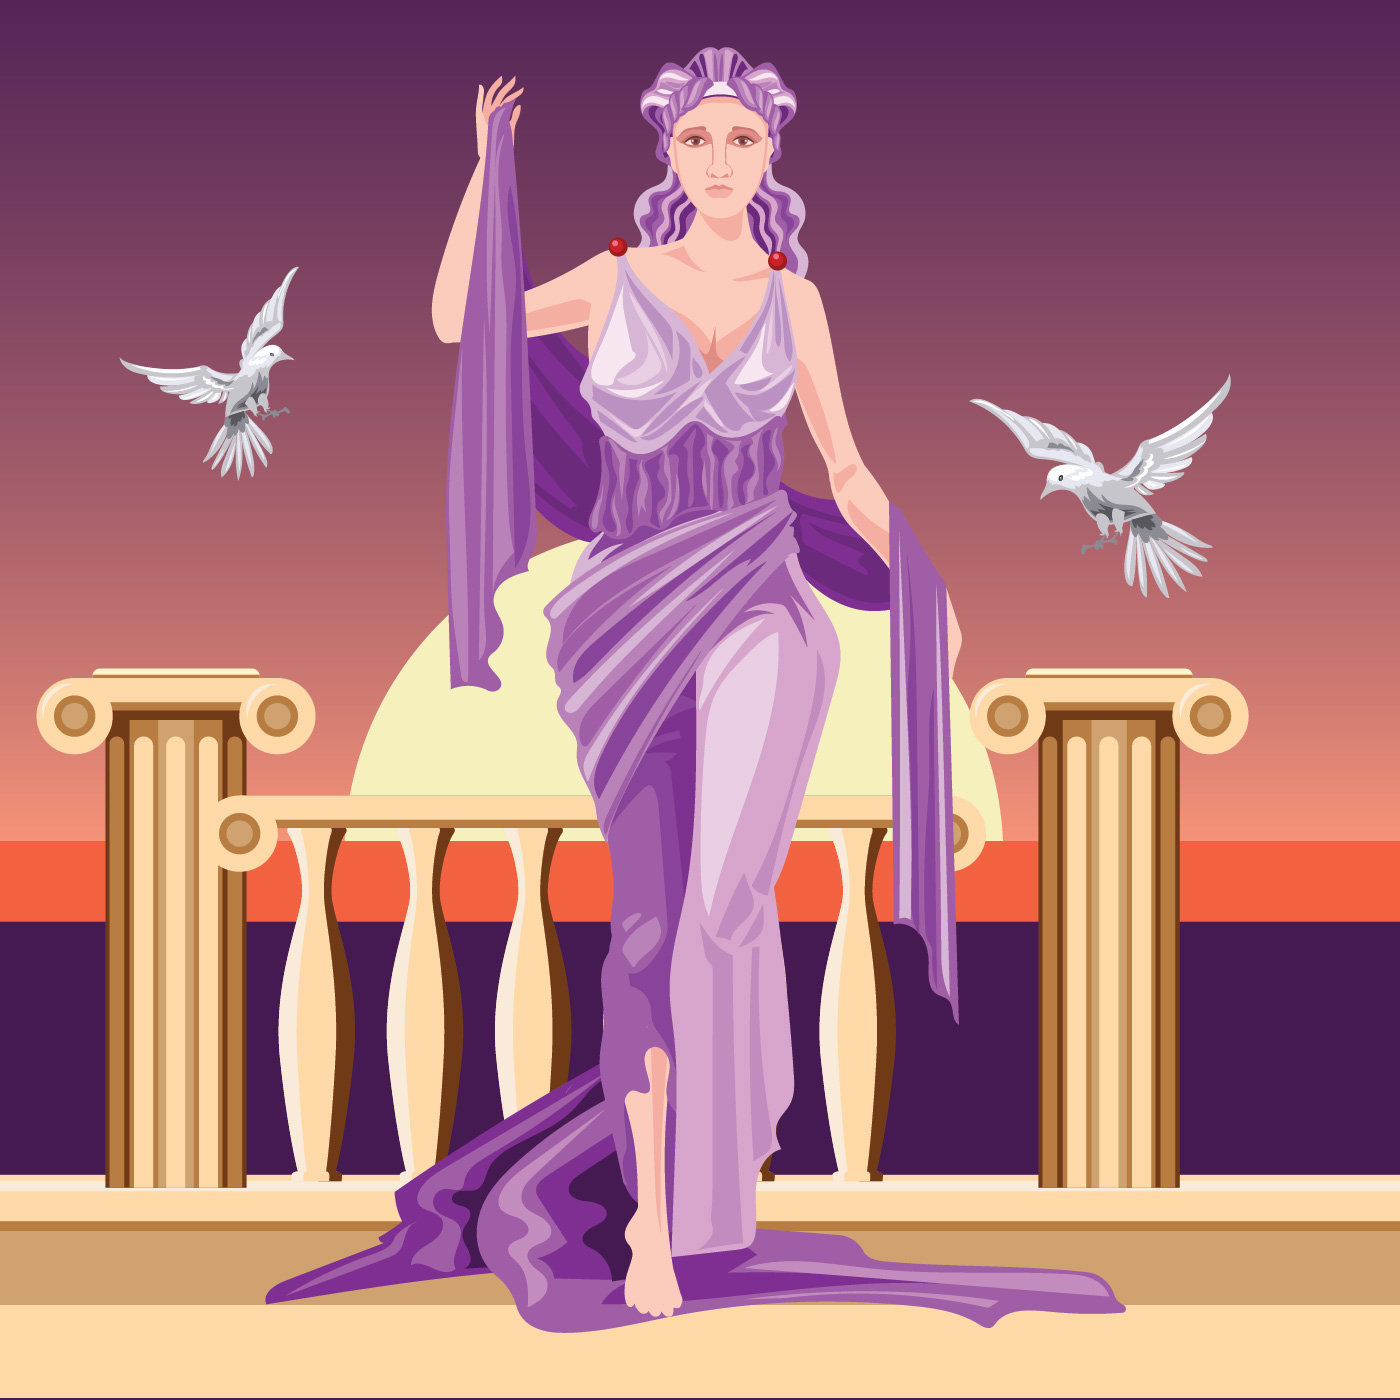 Classical Greek Goddess Aphrodite in Tunic Raising Arms ...